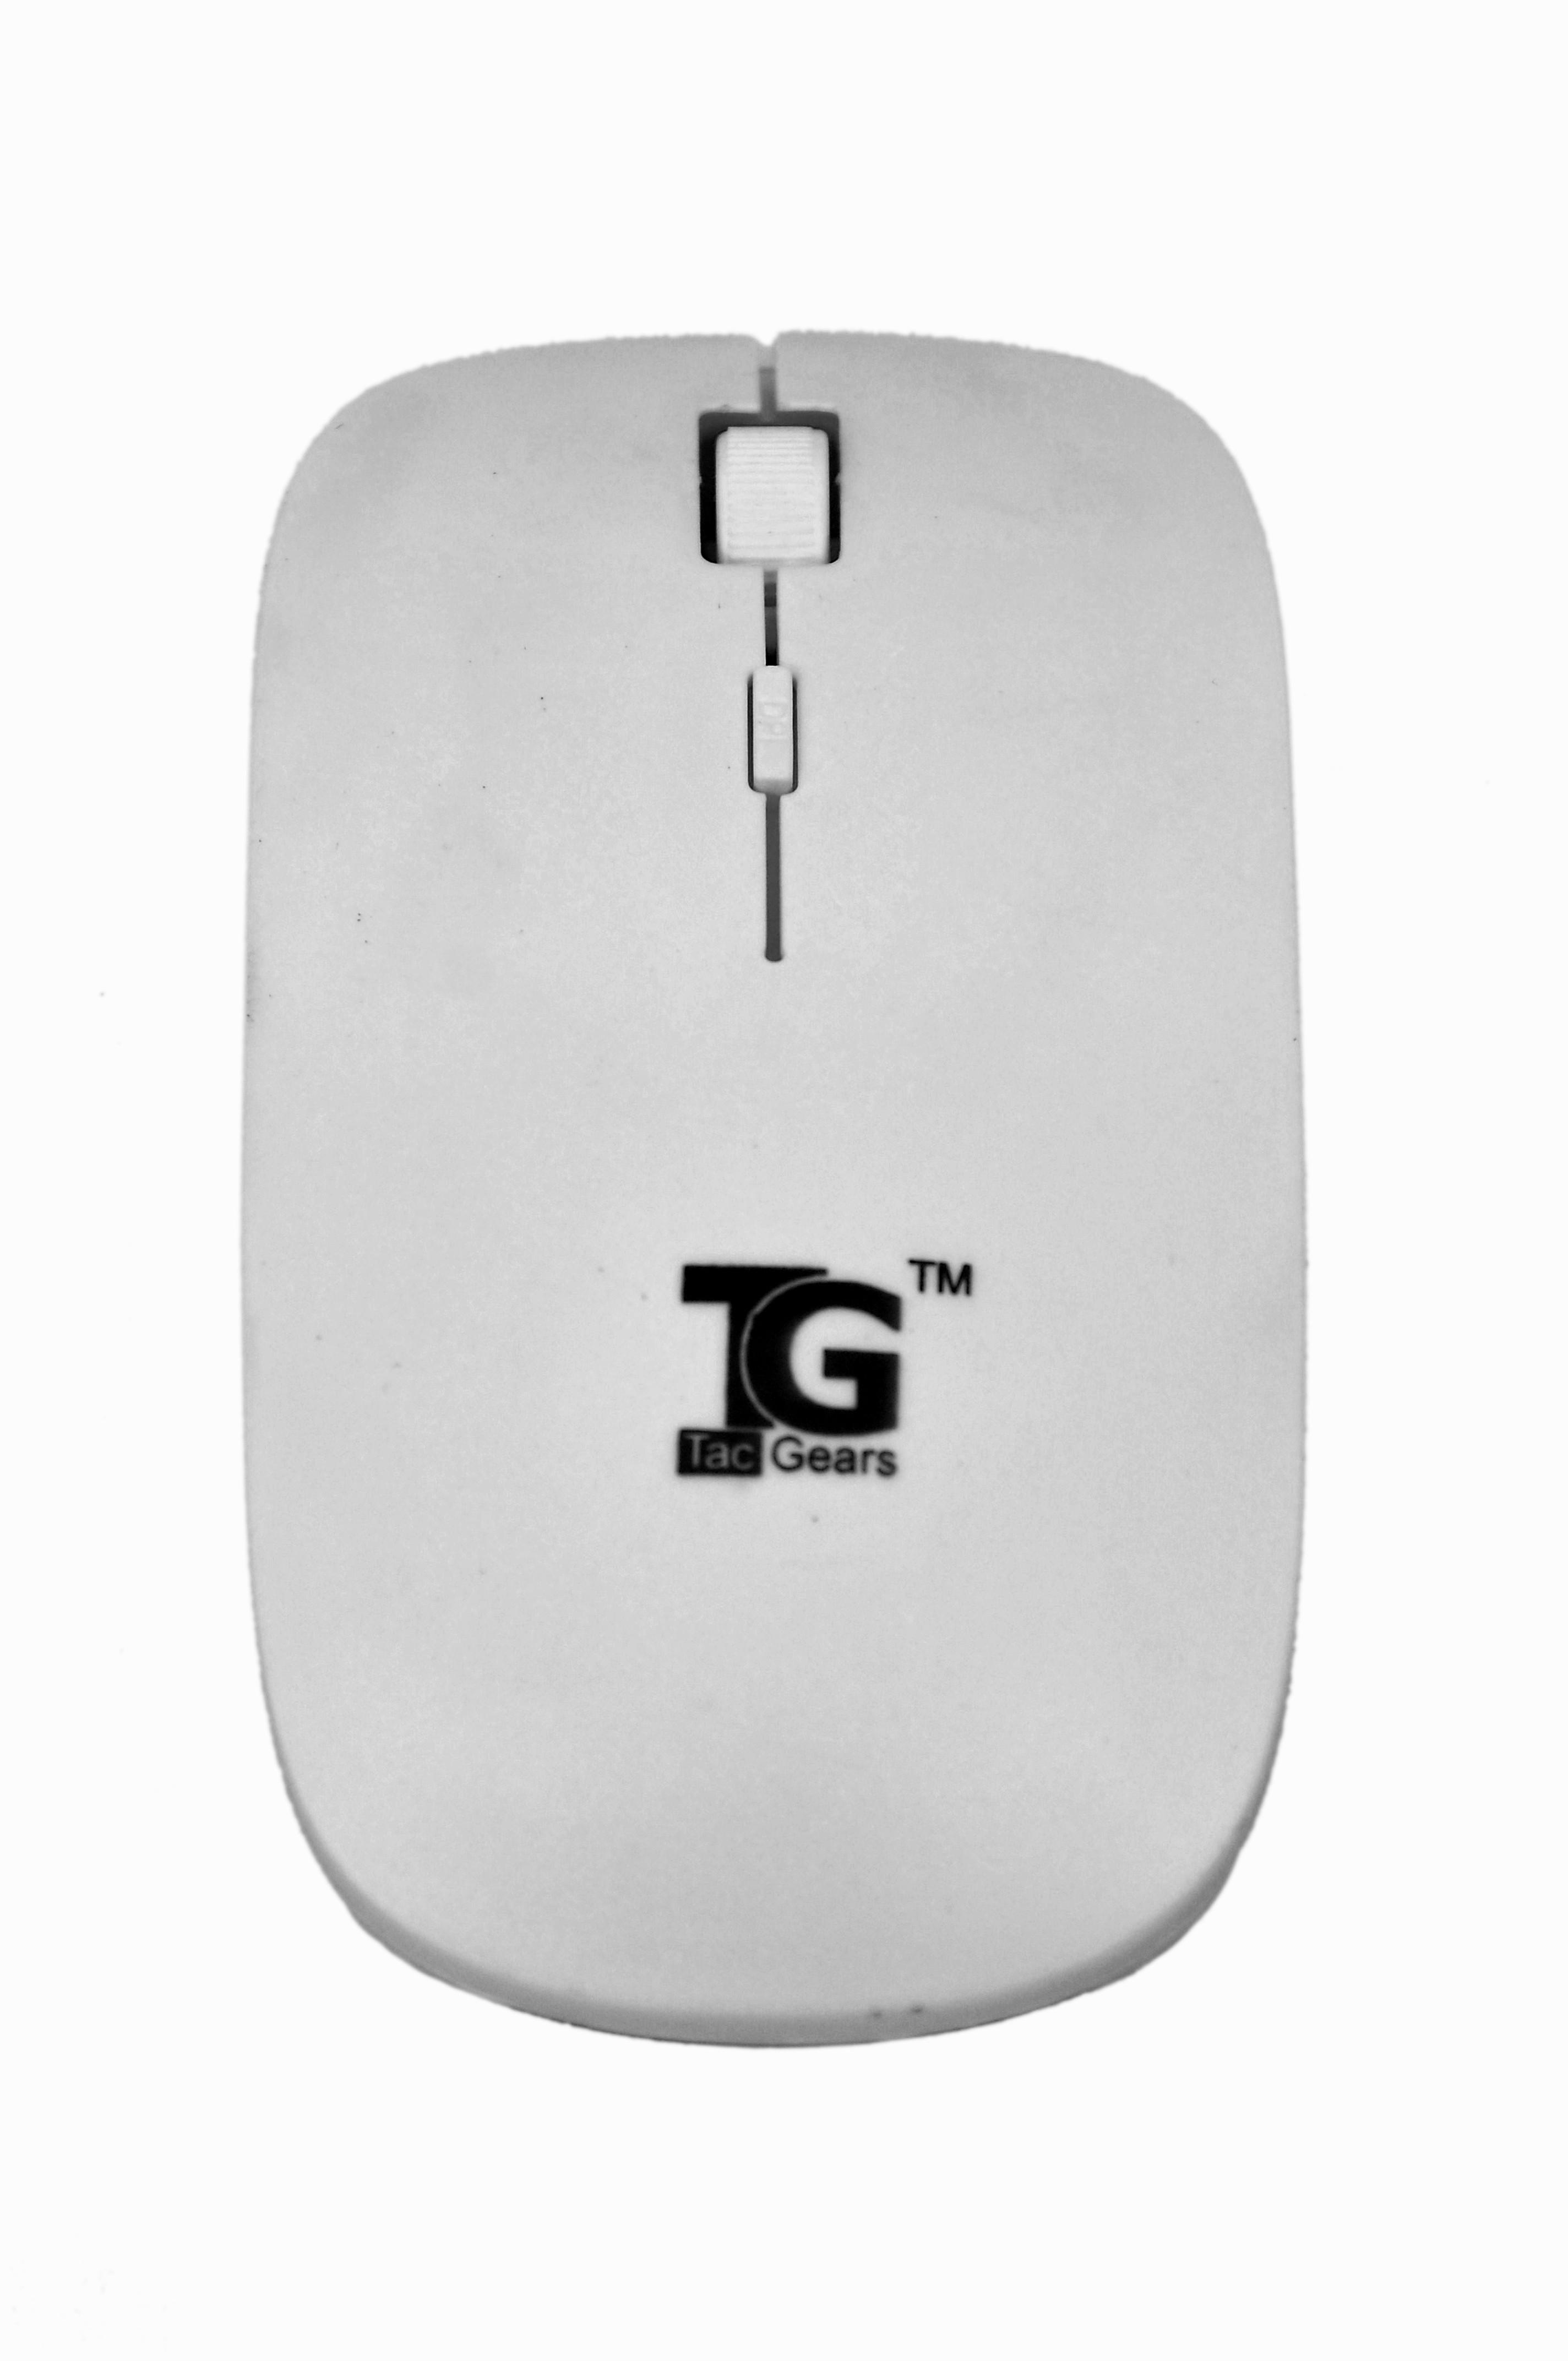 Flipkart - Wireless Mouse Just Rs 249